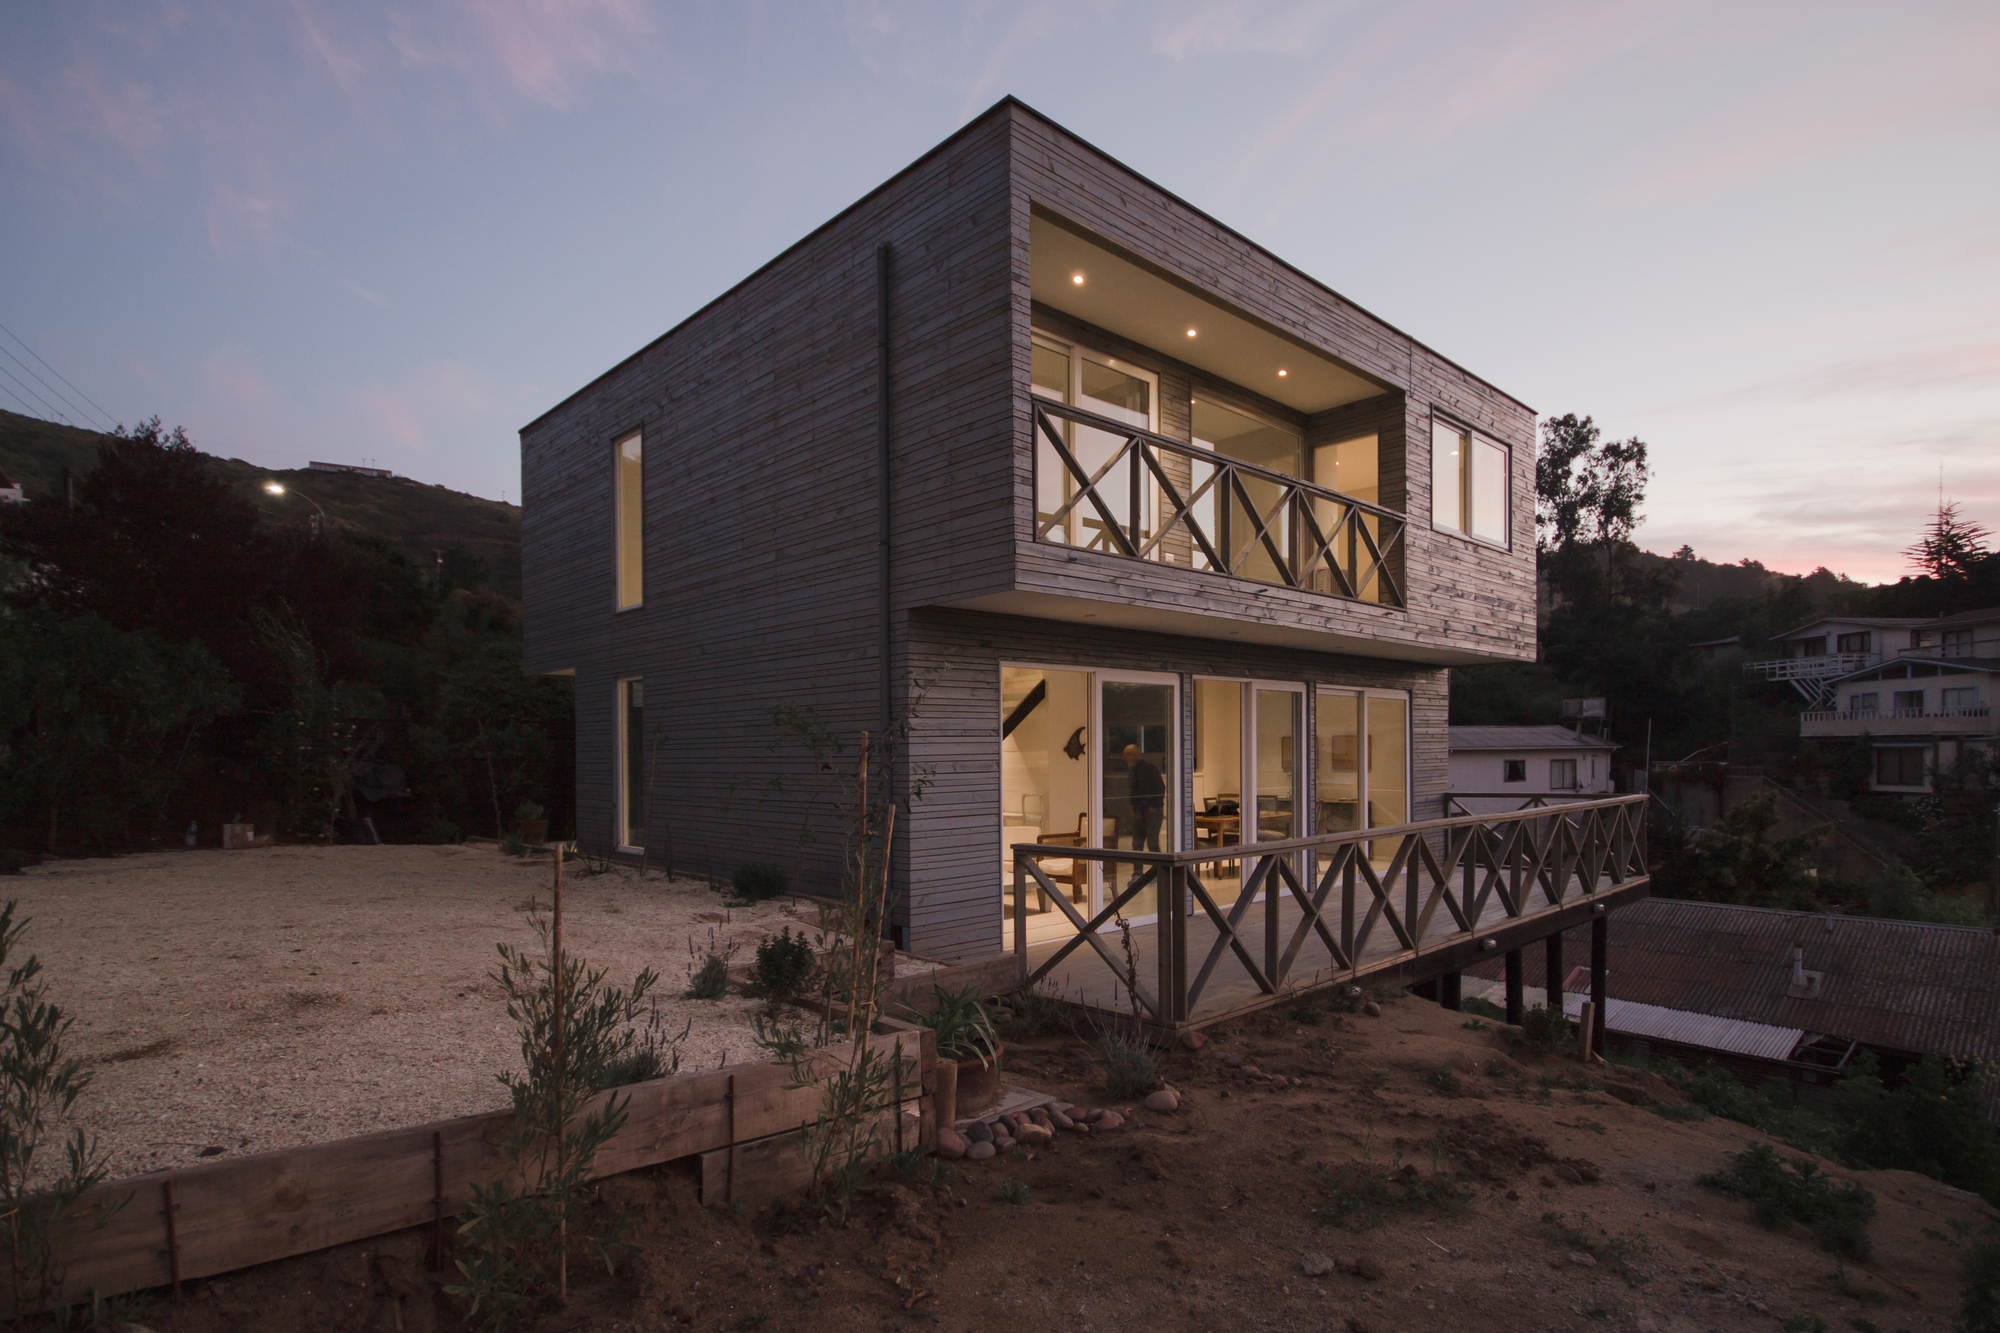 Galeria de casa zapallar paarq arquitectos 1 for Arquitectos para casas